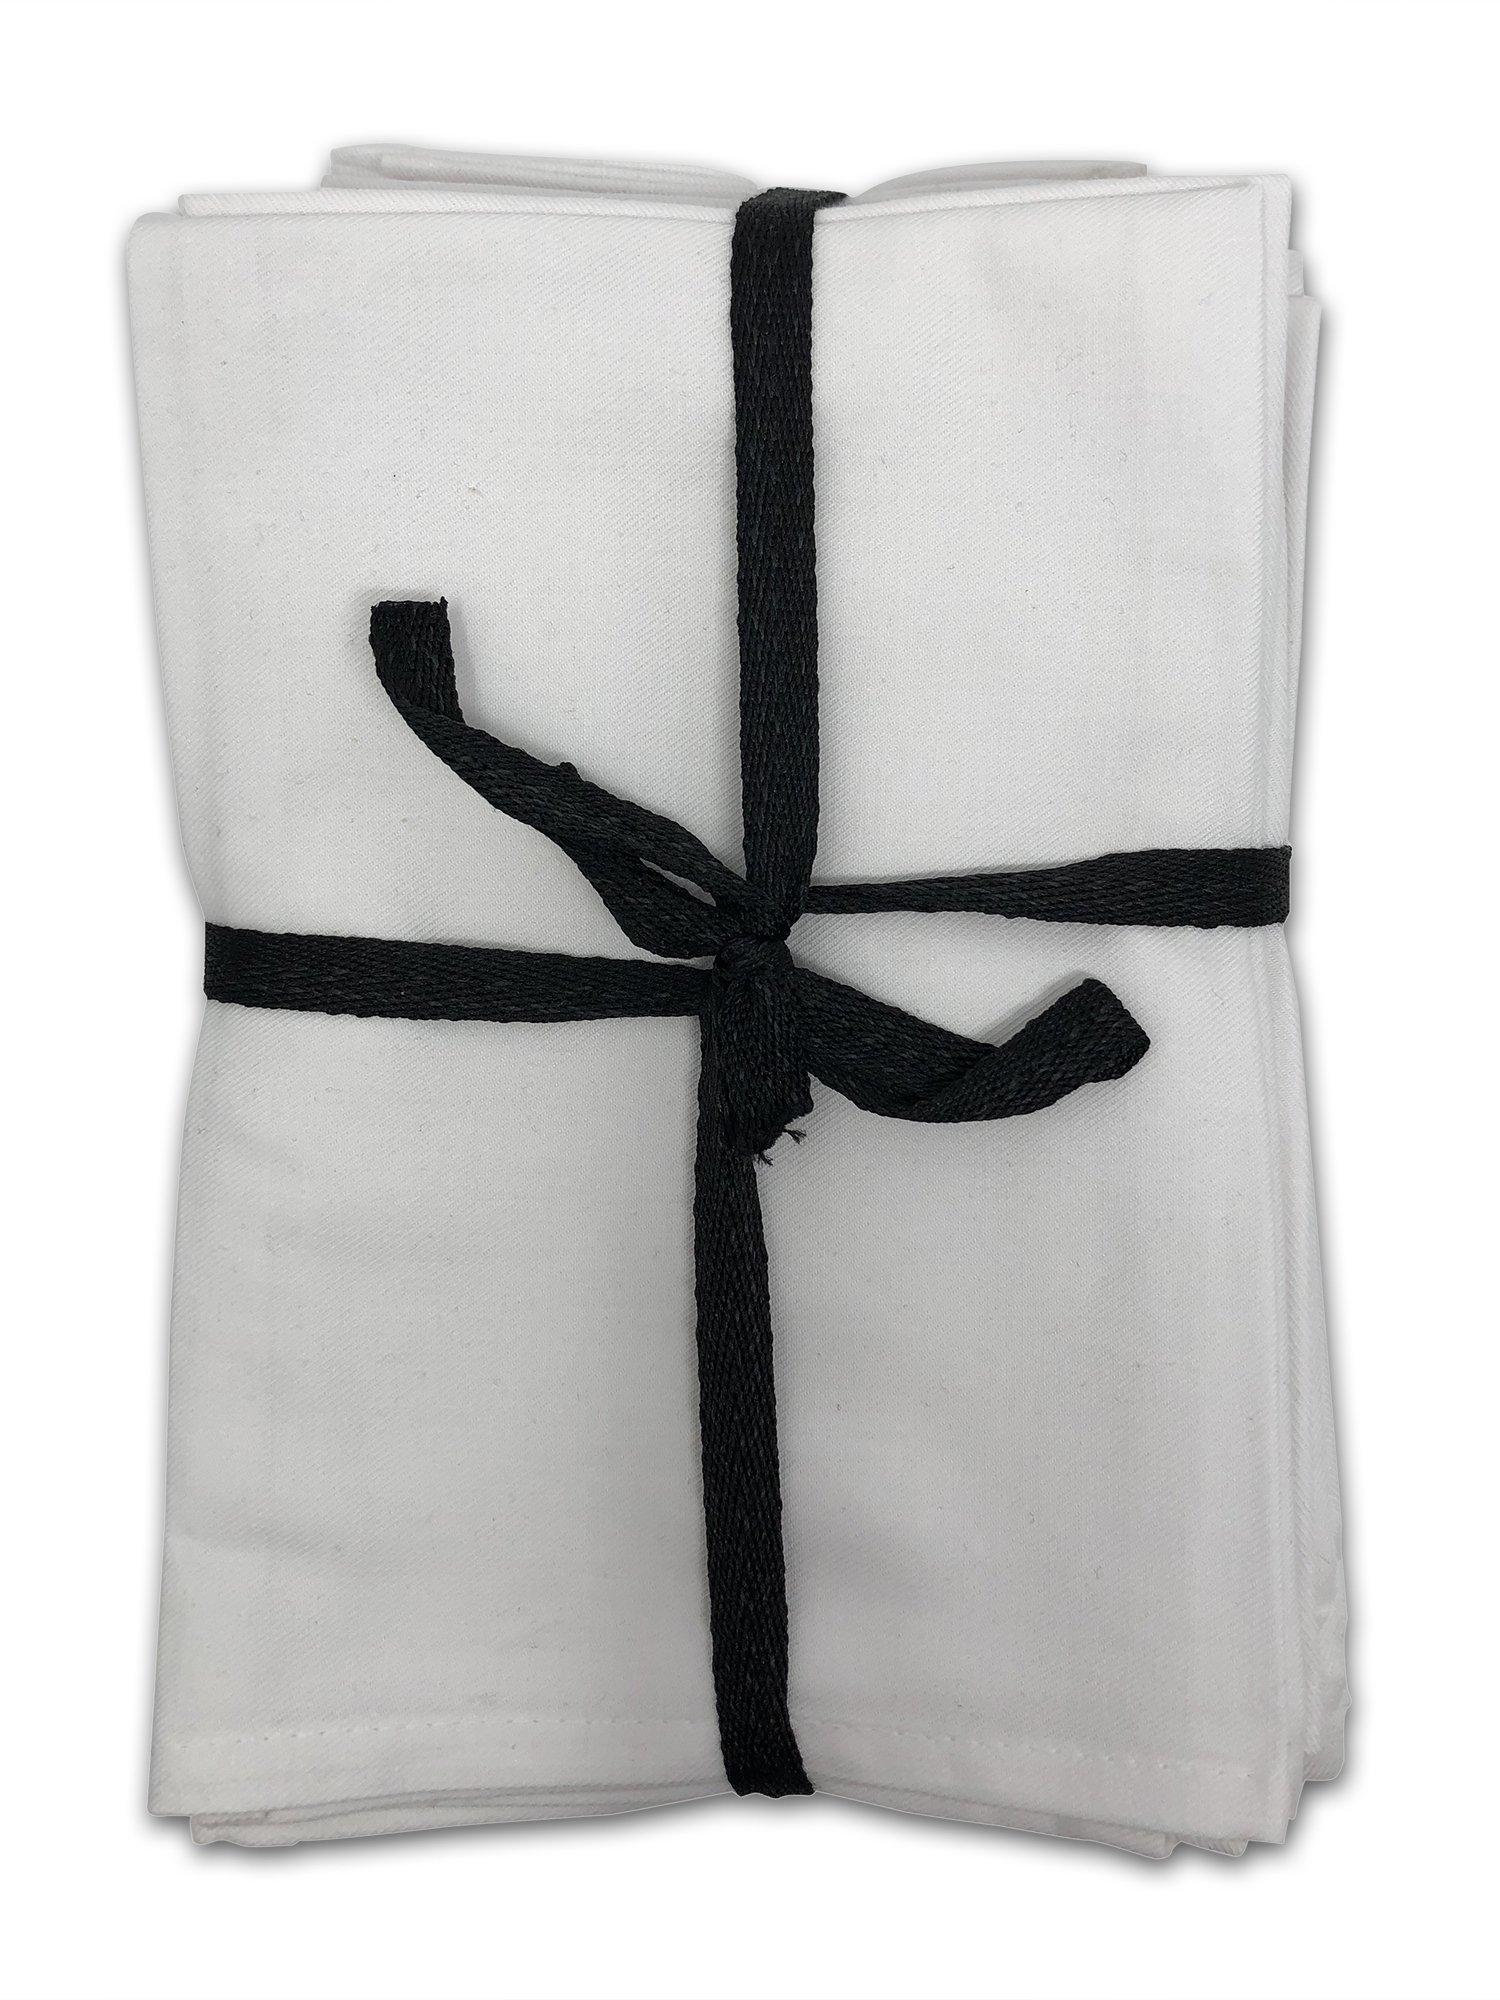 MoLi Products 100% Egyptian Cotton Cloth Dinner Napkins 12 Pack Lunch Linen – Decorative Reusable Fabric Table Linens Servilletas de Tela Restaurant Wedding Luncheon Napkin (White)